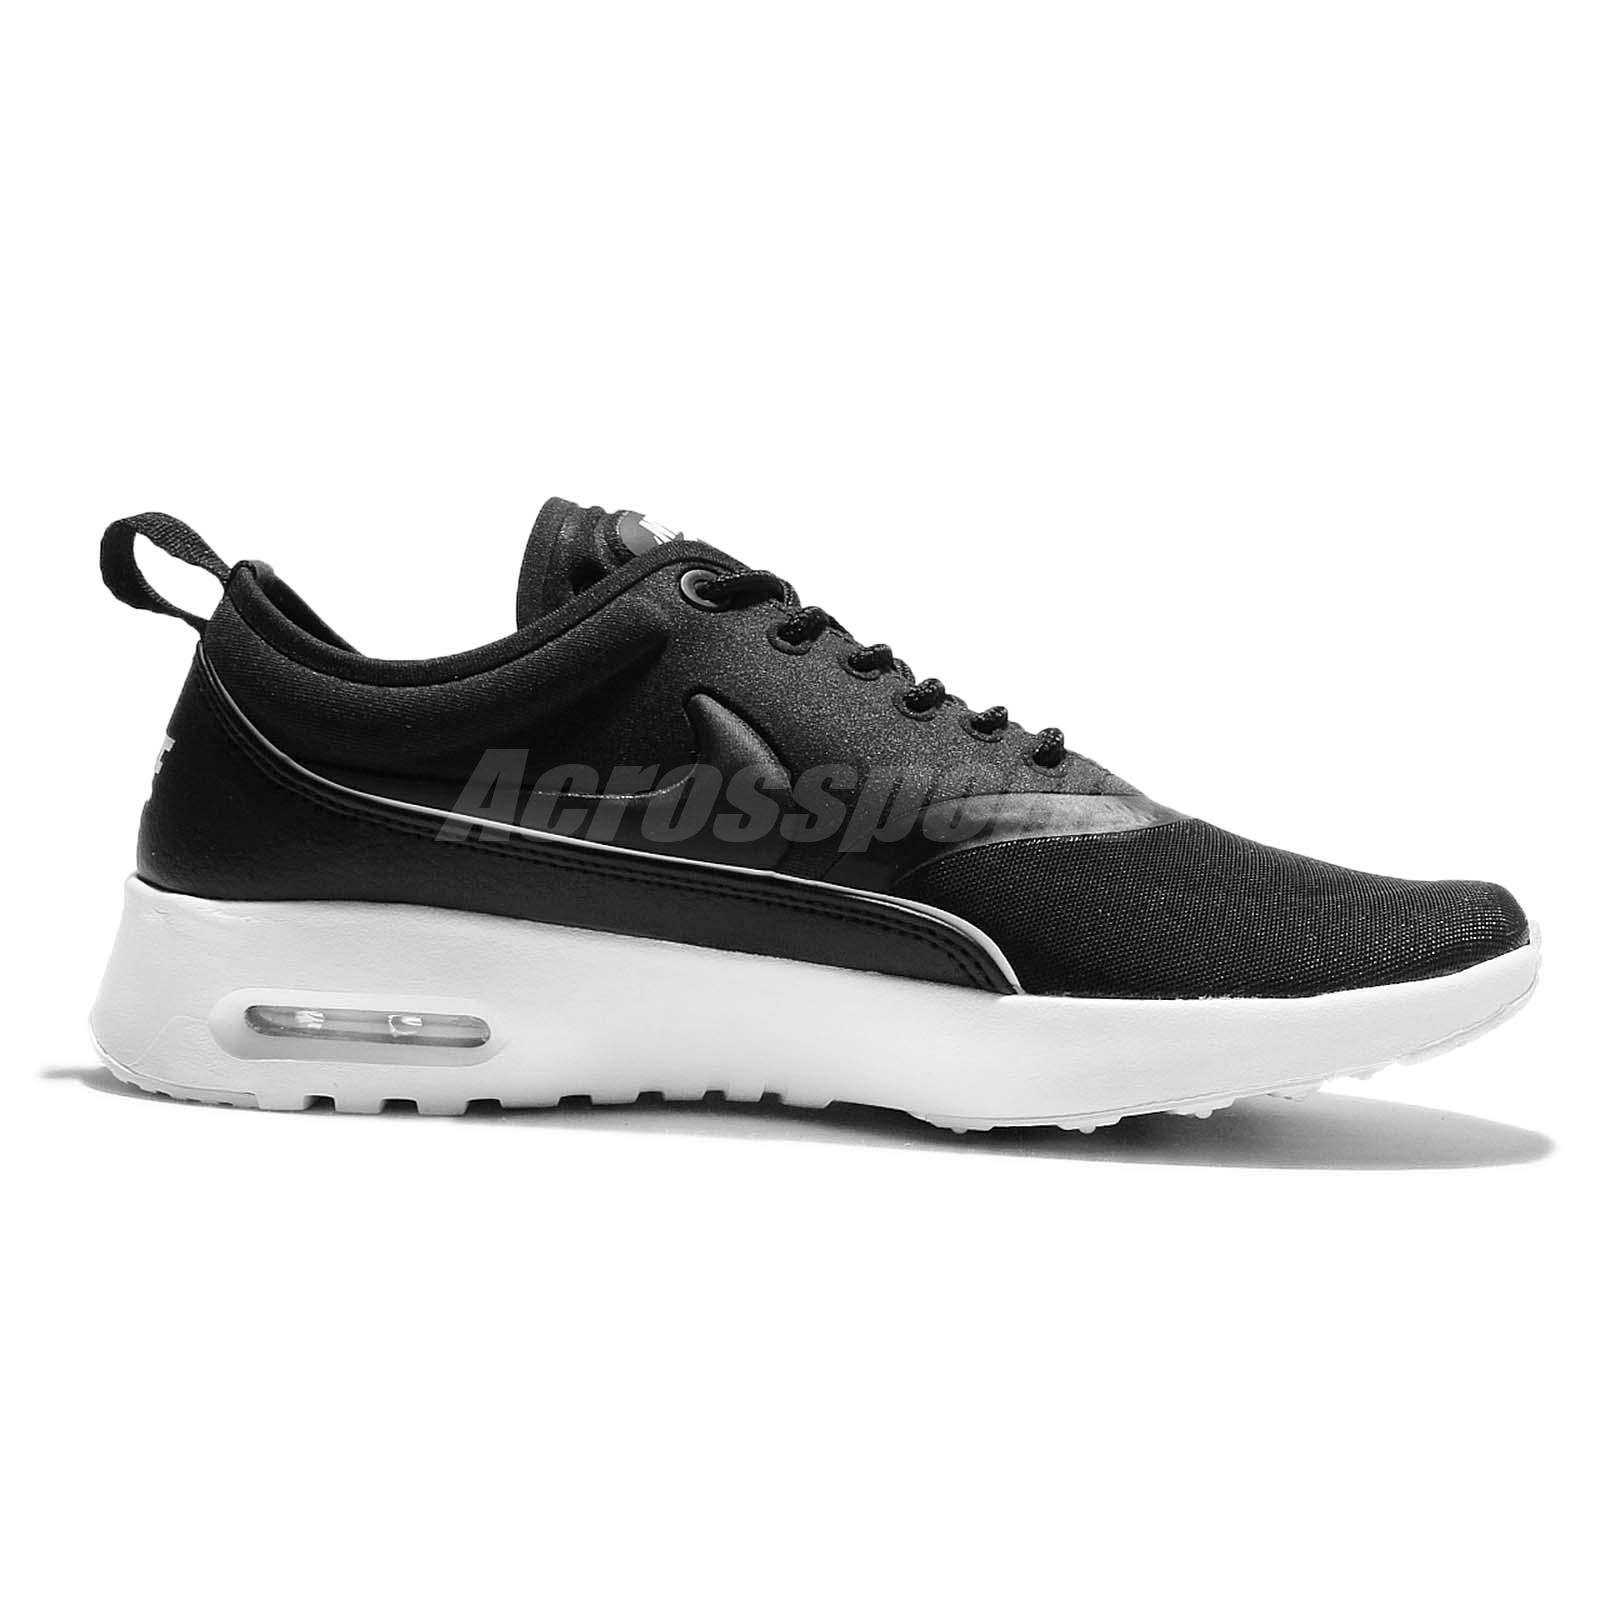 Nike Air Max Thea Blanco Y Negro Perro Australiano qEwm06MWci